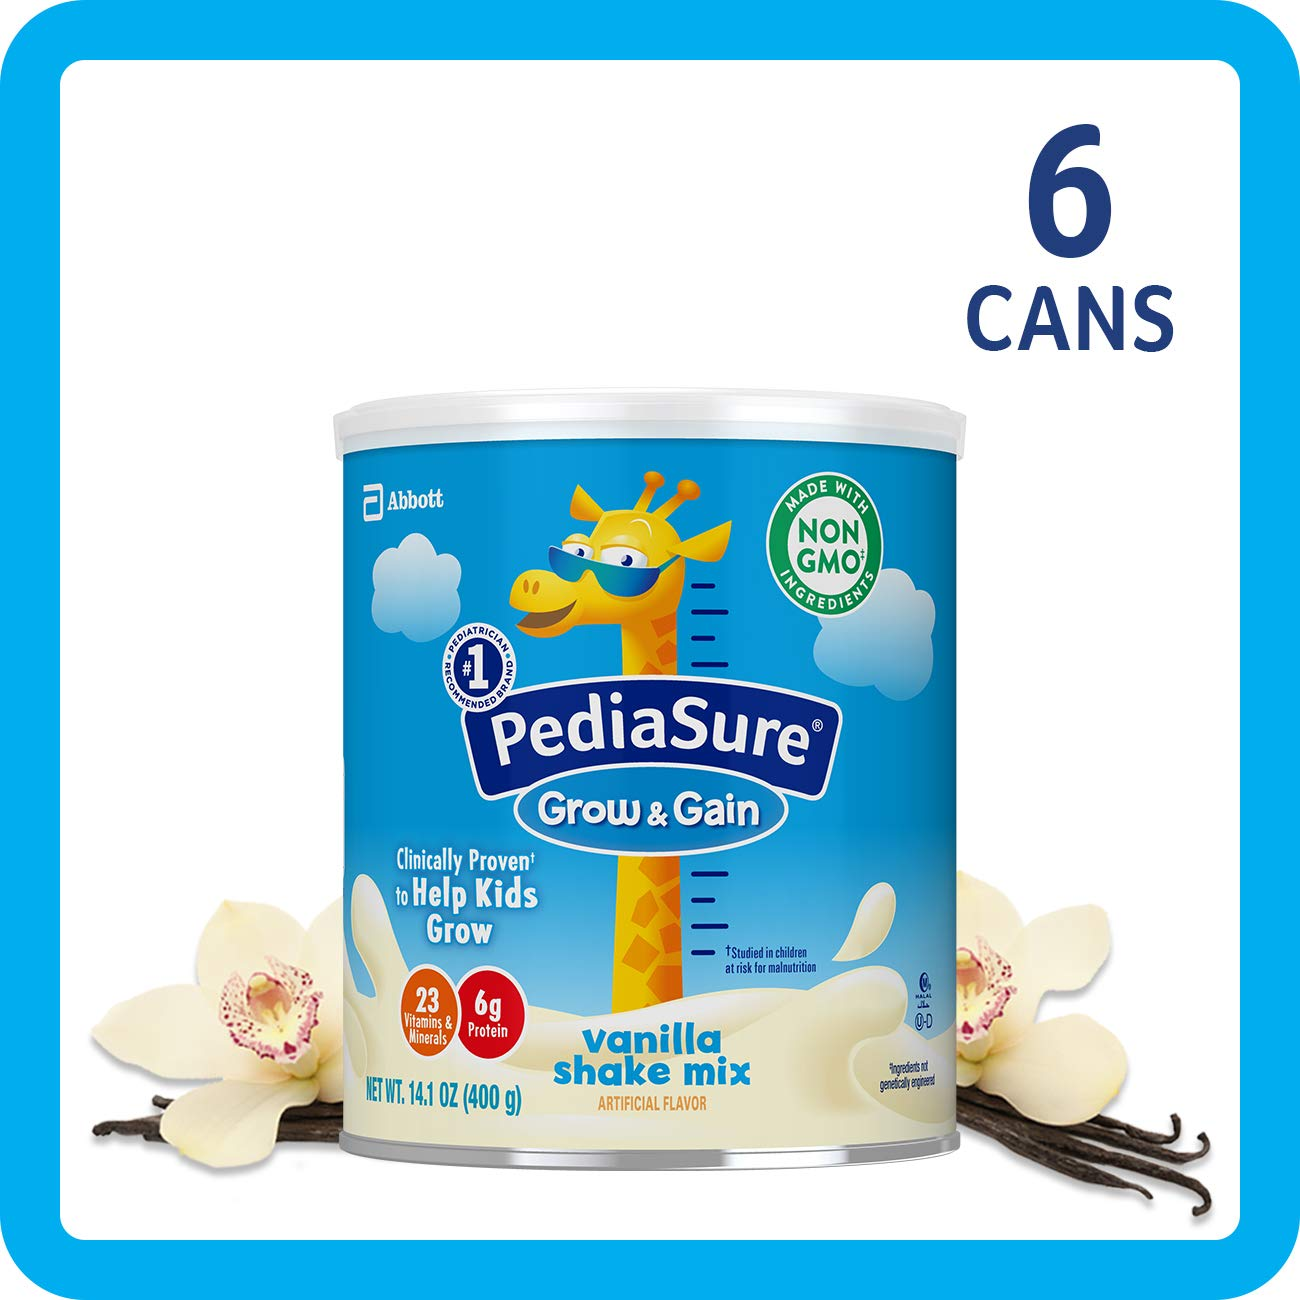 PediaSure Grow & Gain Non-GMO Shake Mix Powder, Nutritional Shake For Kids, With Protein, DHA, Antioxidants, and Vitamins & Minerals, Vanilla, 14.1 oz, 6-Count